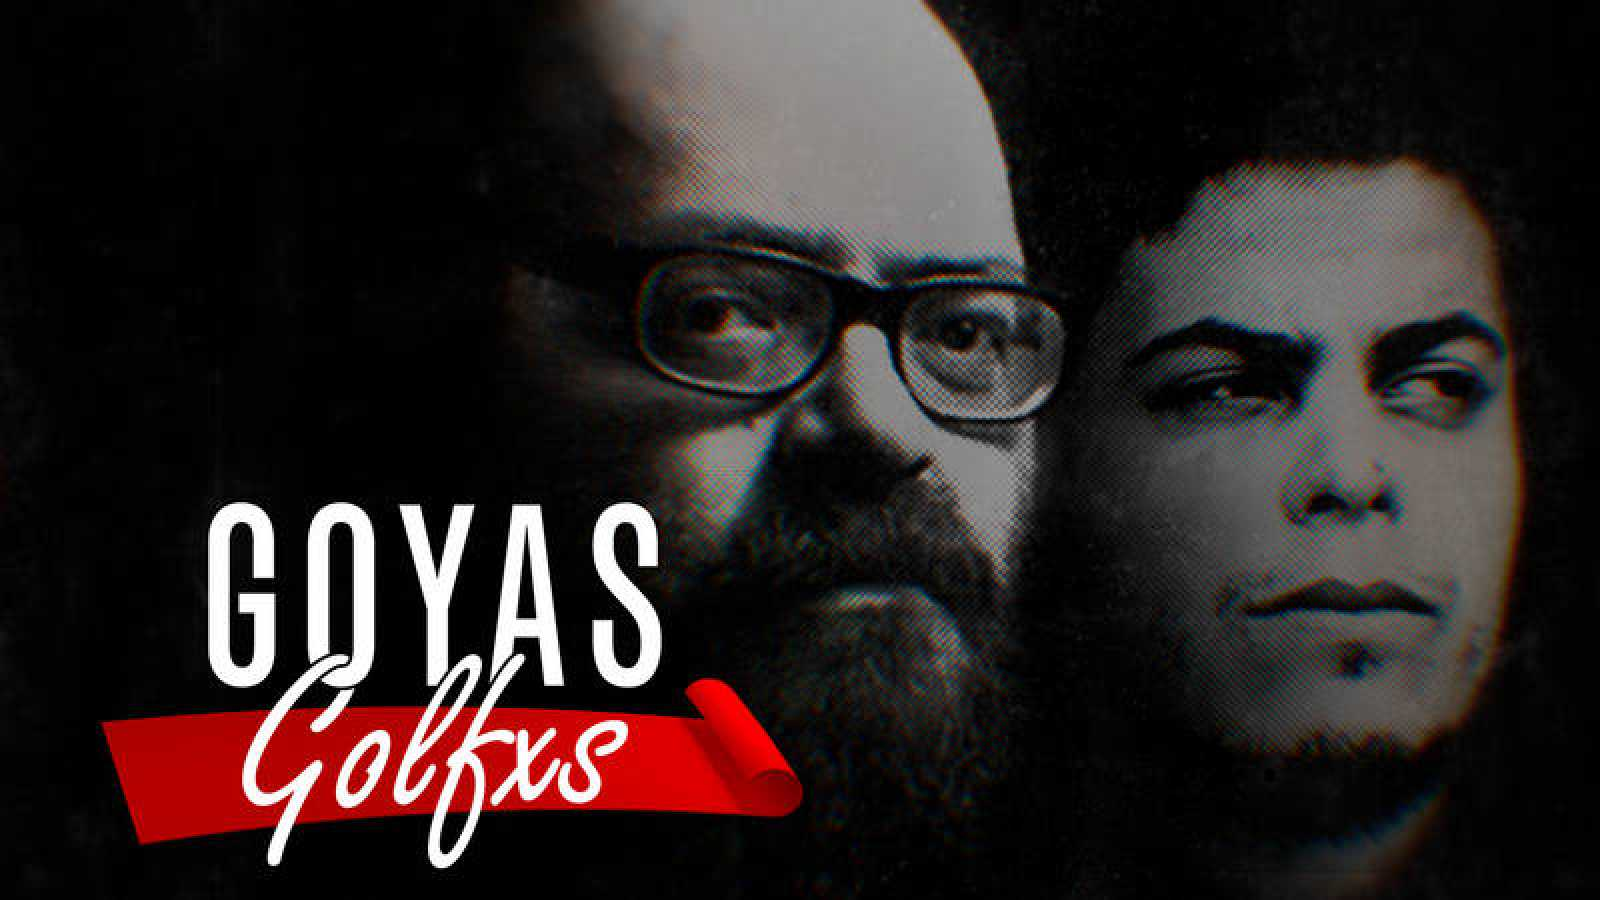 Los Goya Golfxs, minuto a minuto